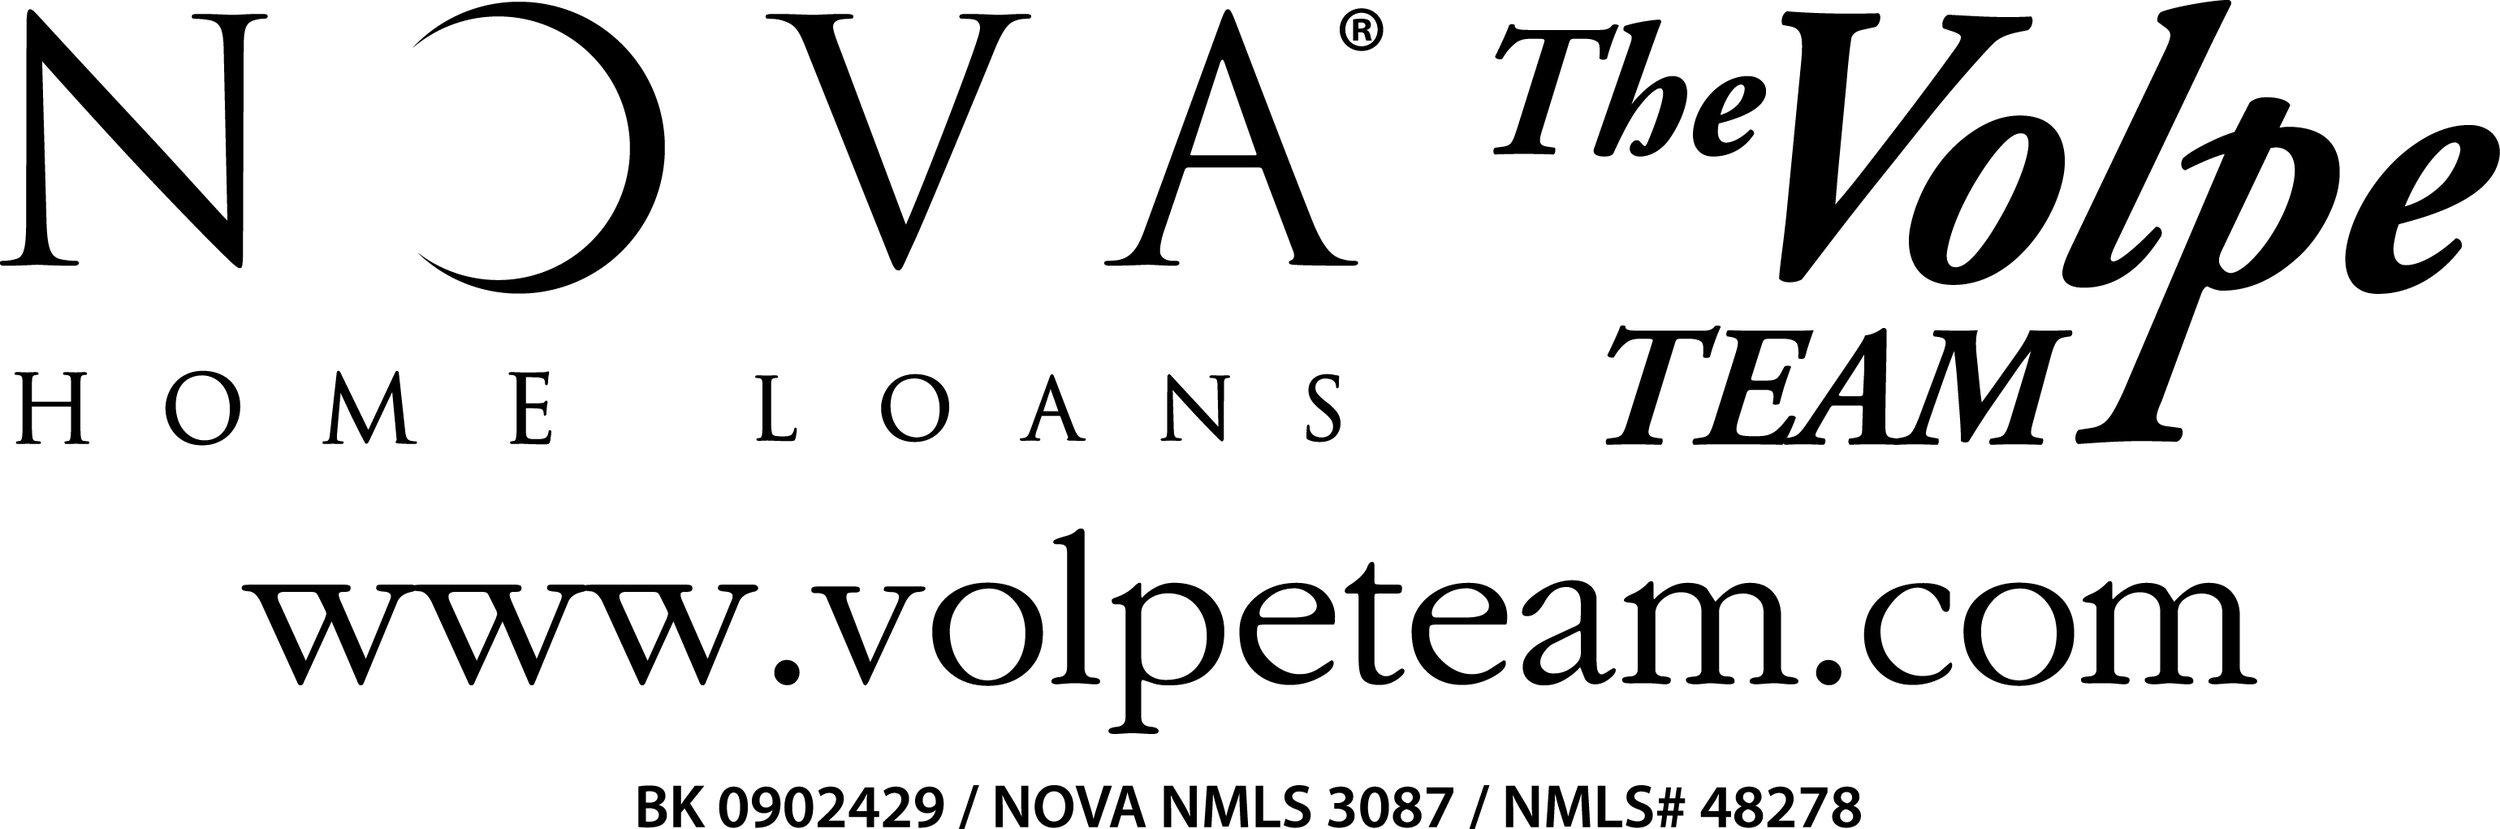 Nova Home Loans - the Volpe Team - Badge Sponsor